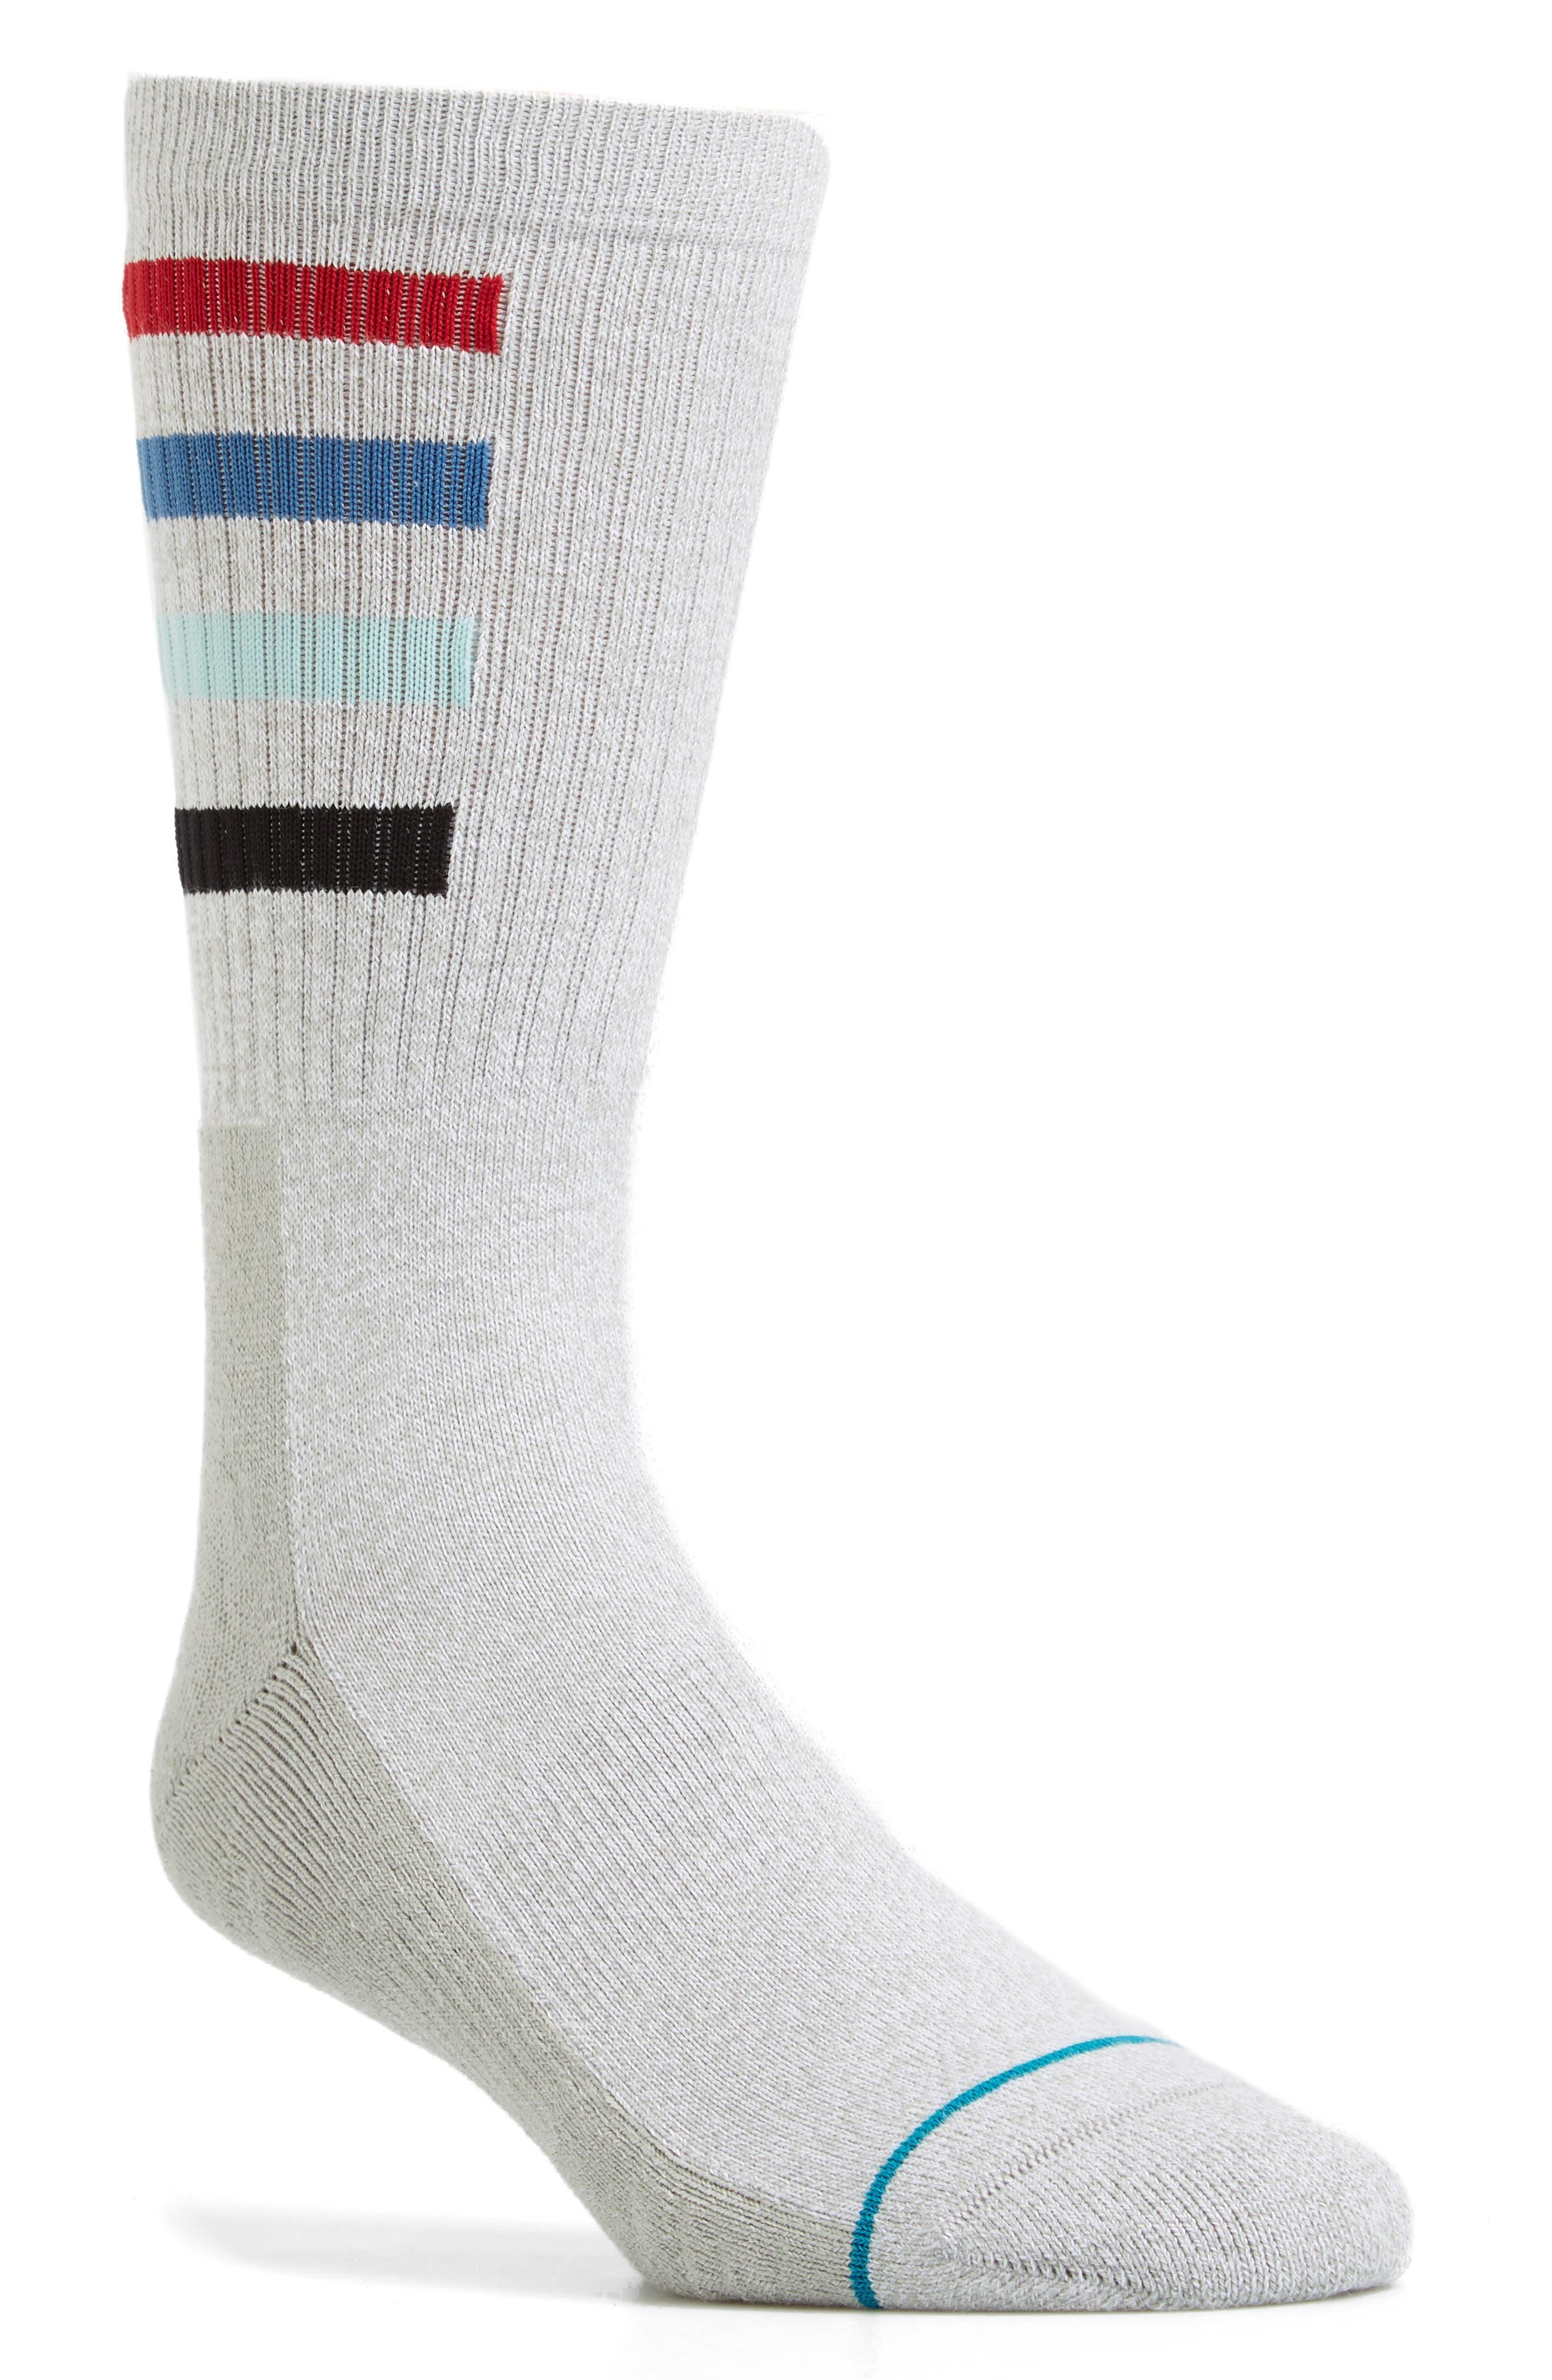 Alternate Image 1 Selected - Stance Croton Crew Socks